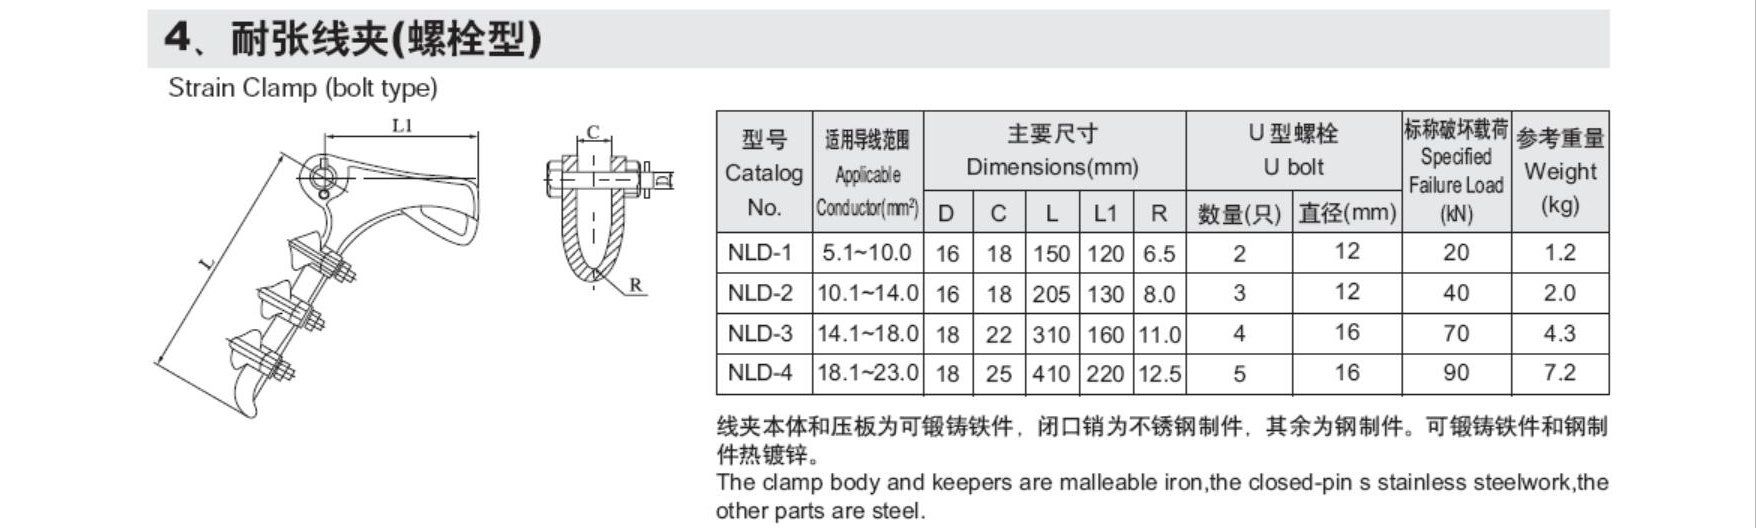 Bold Type Strain Clamp - NLD